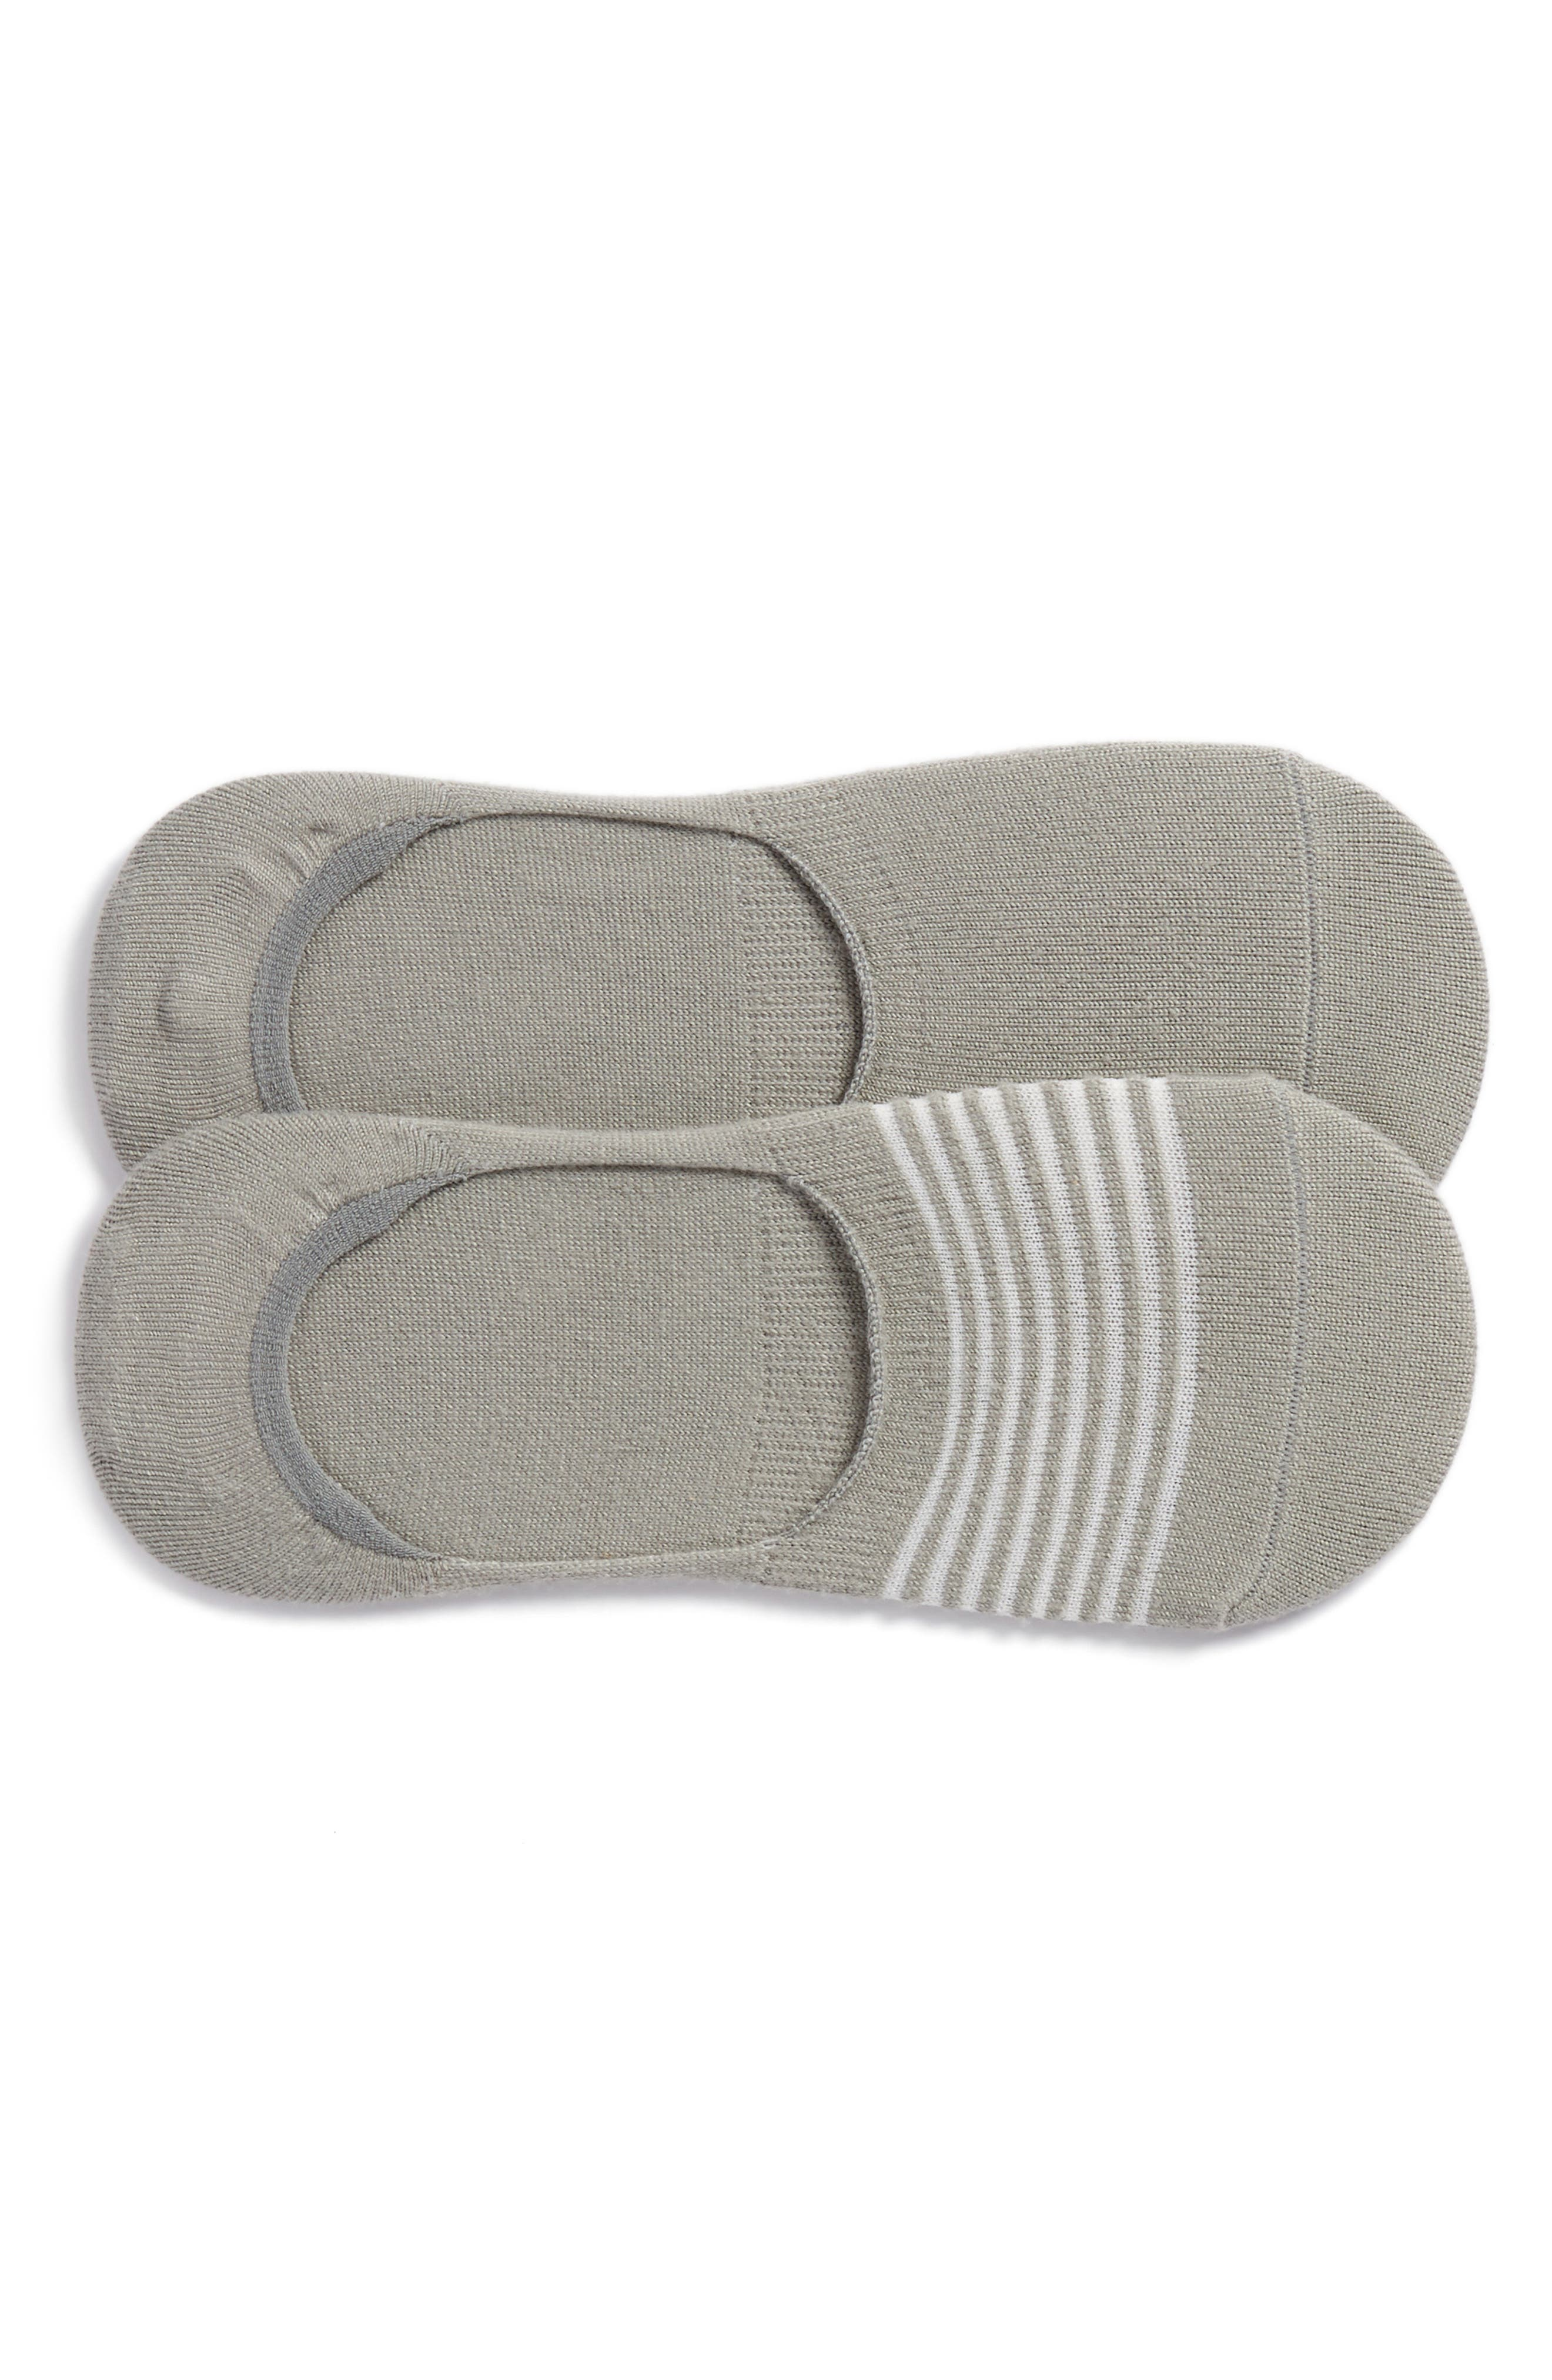 2-Pack Beach Mesh Liner Socks,                             Main thumbnail 1, color,                             Concrete